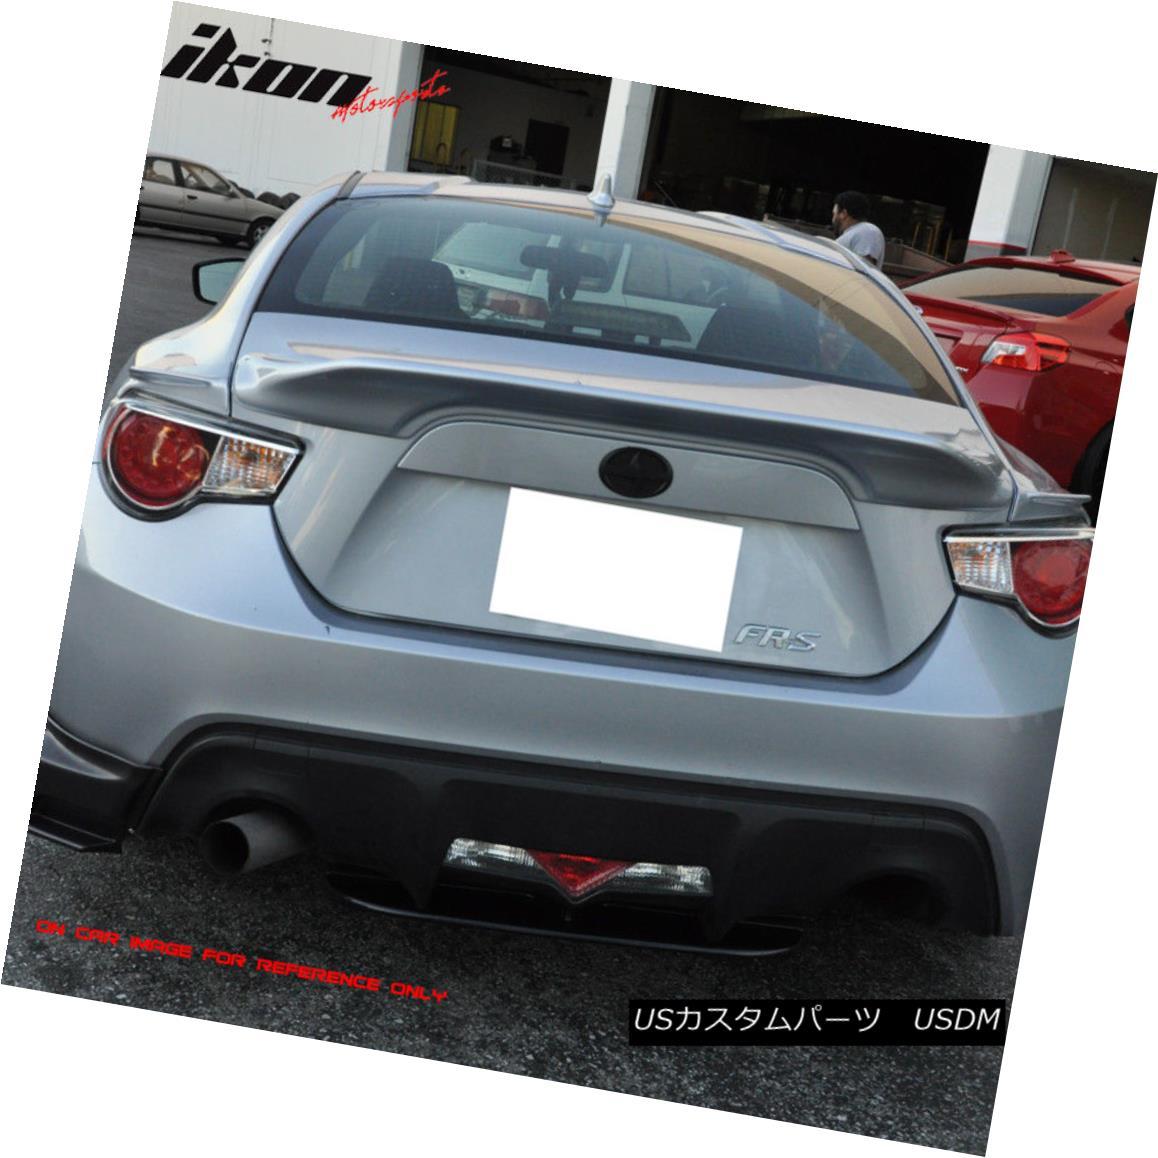 Carbon Fiber Rear Bumper Exhaust Heat Shield For Nissan R32 GTR BNR32 HCR32 CF